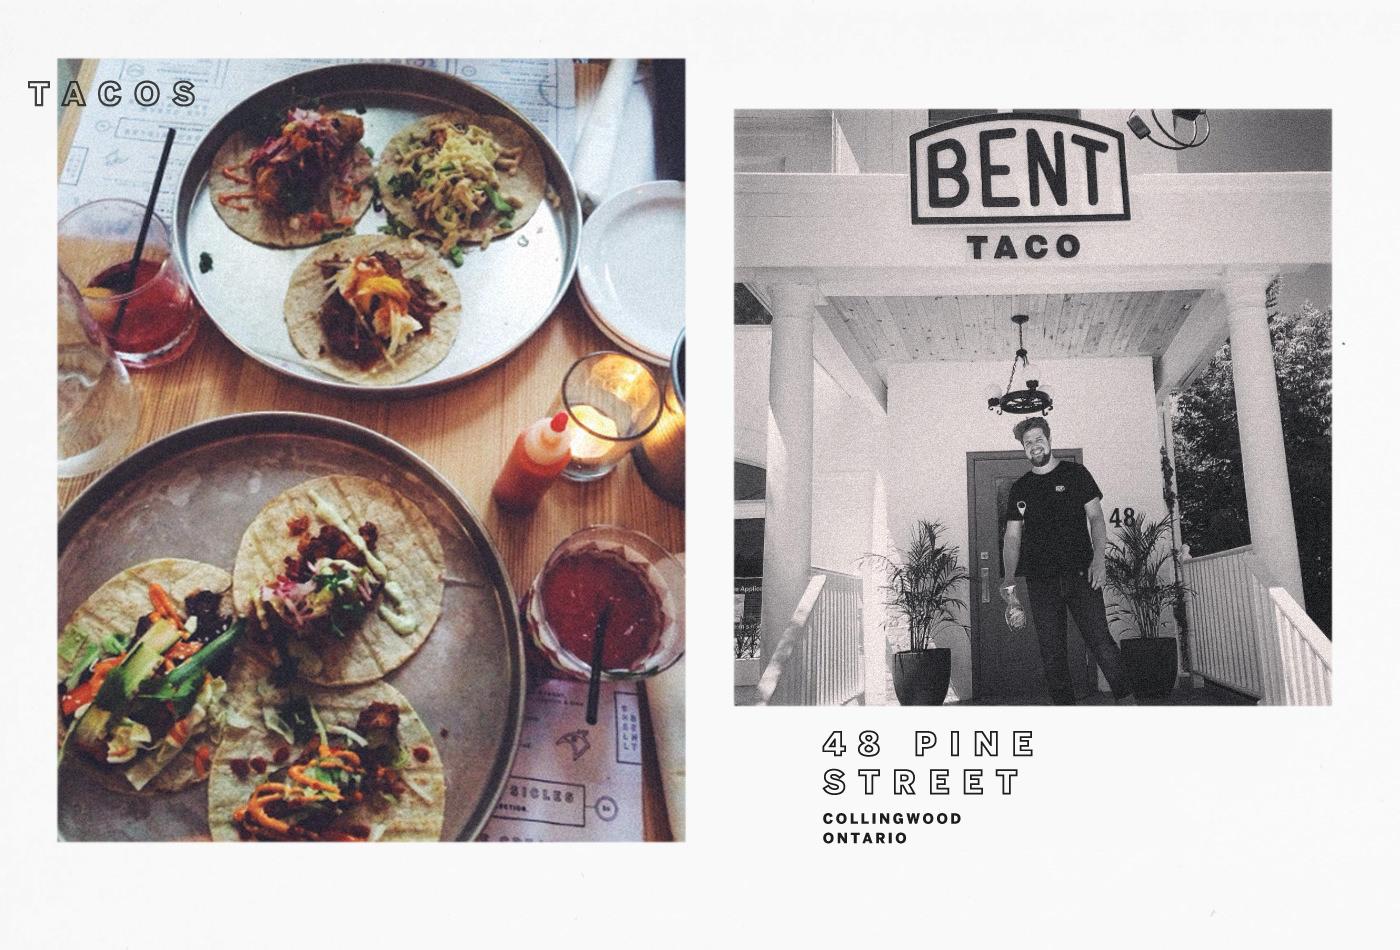 _burritos-benttaco-bent-taco-collingwood-ontario-tacos-burritos-mexican-branding-vacaliebres-